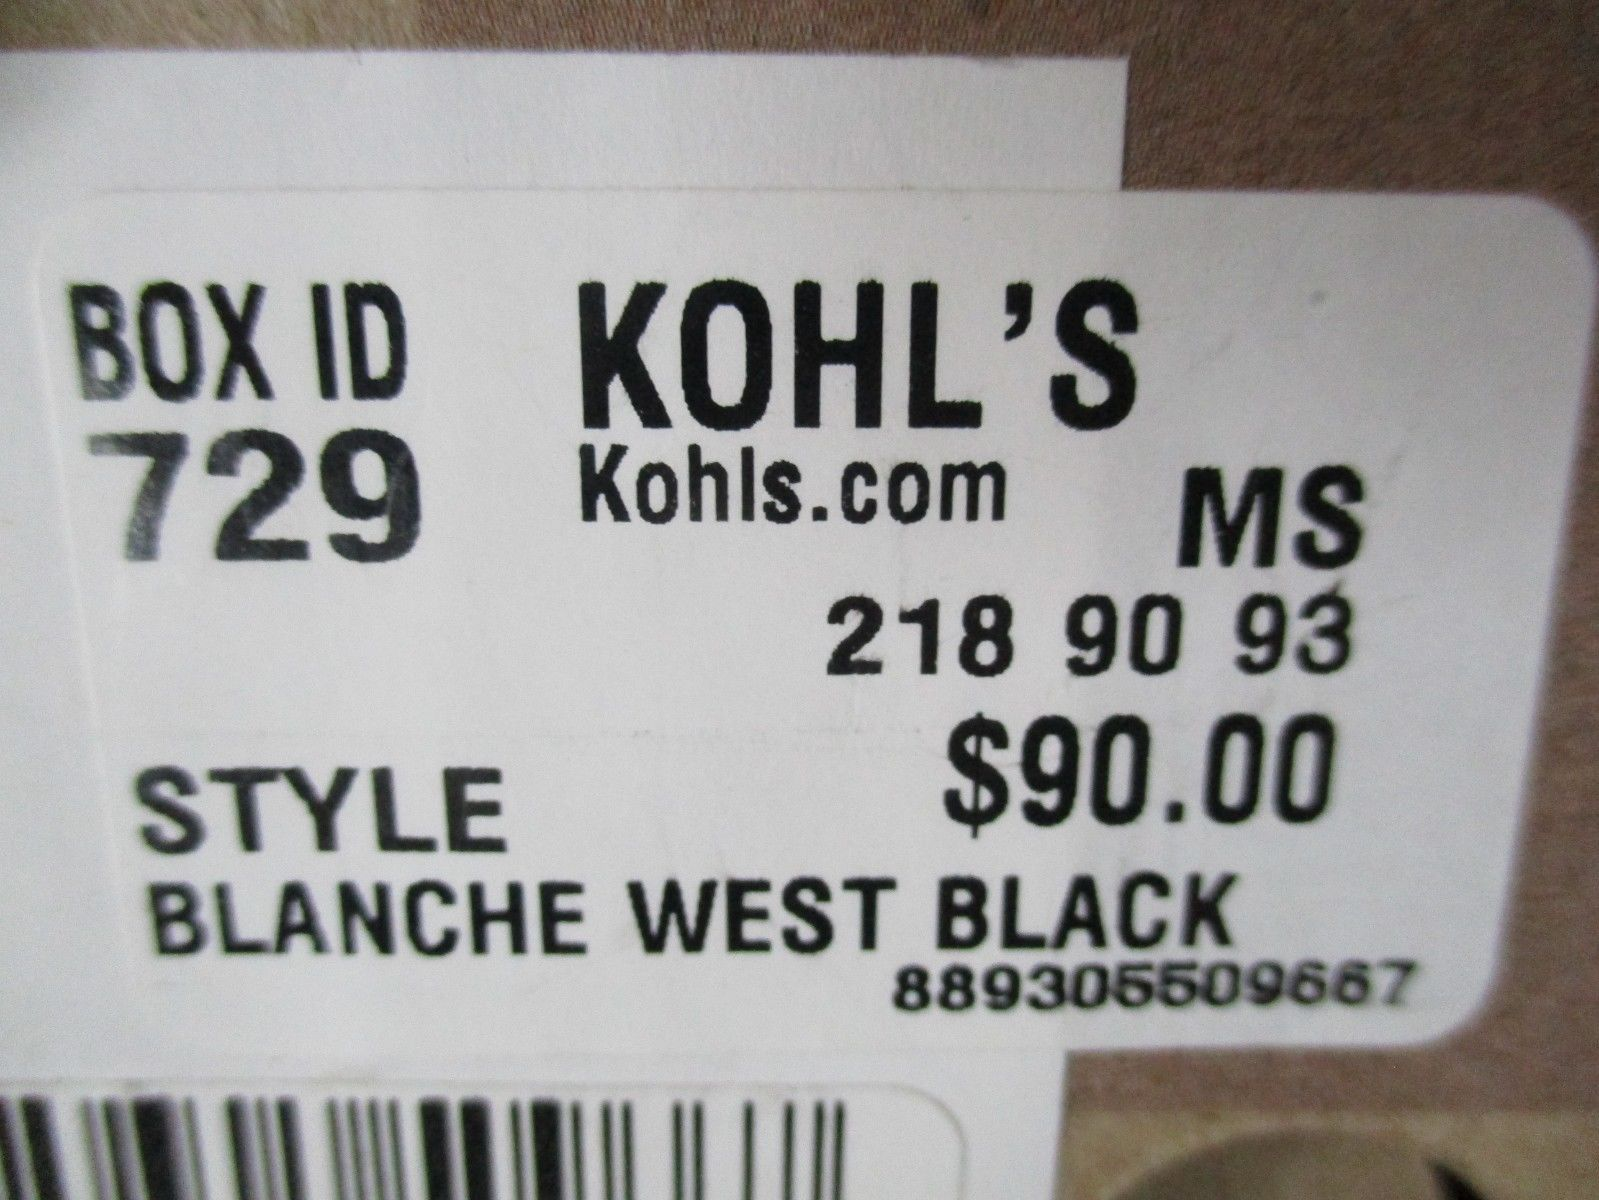 BNIB Clarks Blanche West Women's Flats, black, size 7M, ships w/o box, $90